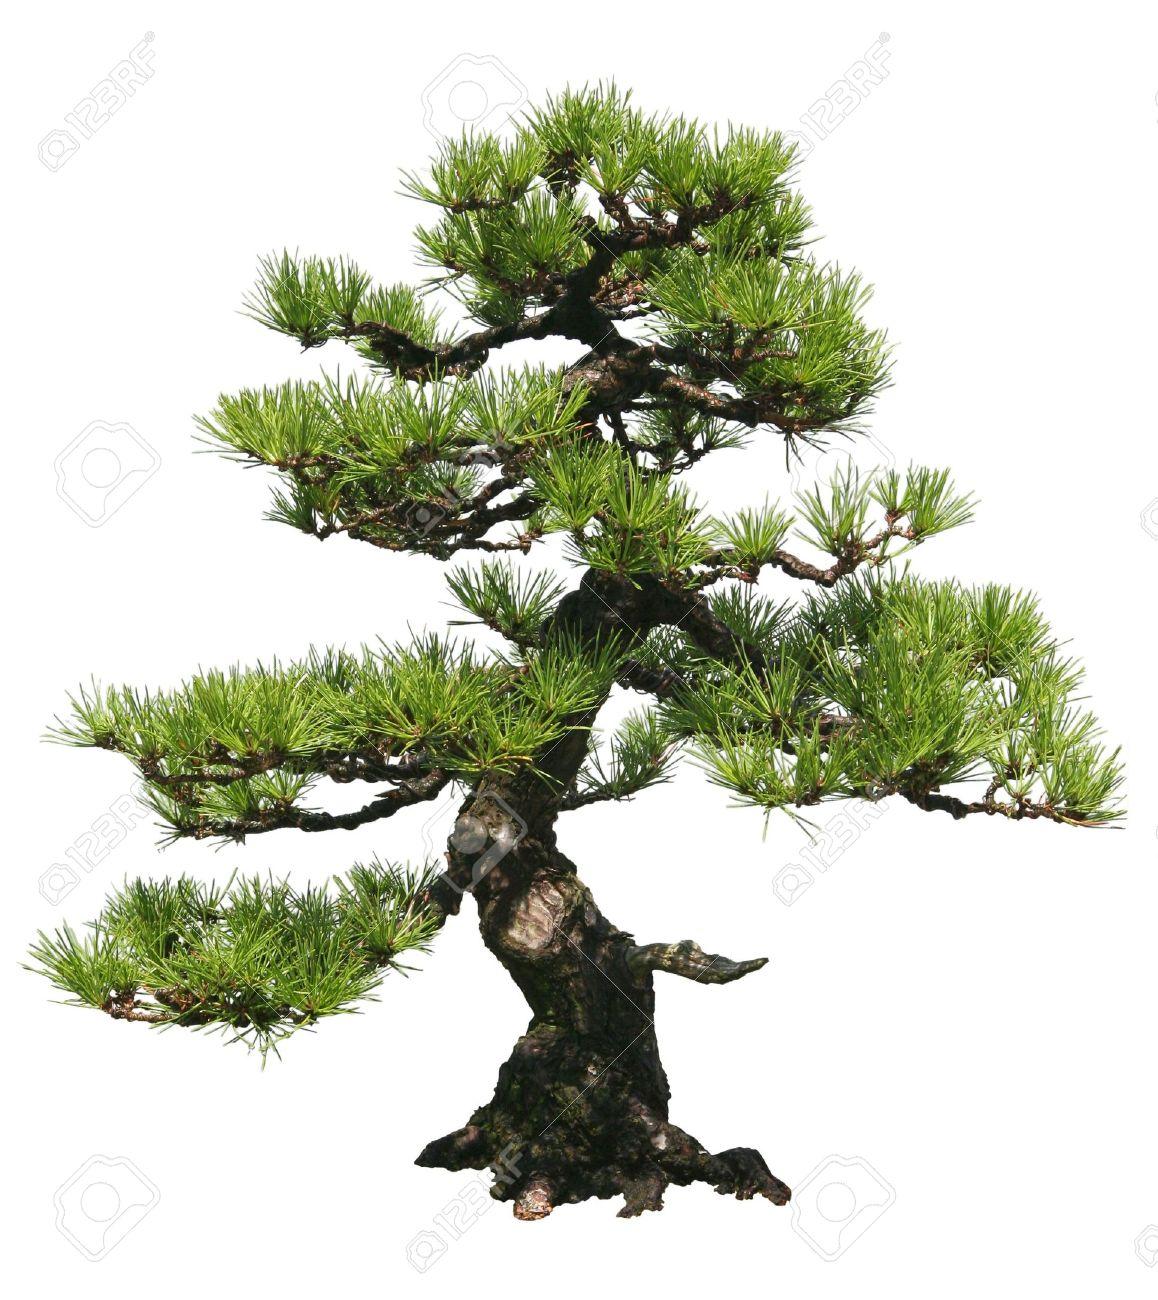 A bonsai tree over a white background Stock Photo - 5562778